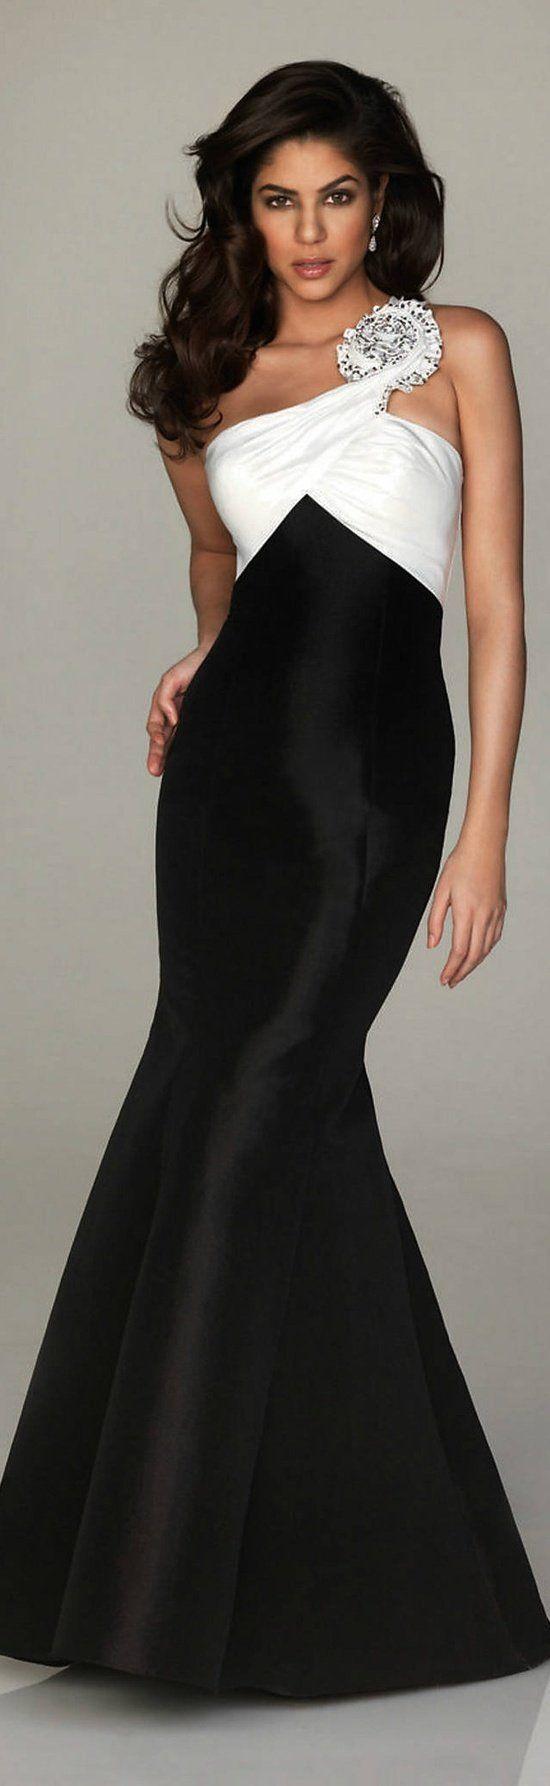 formal dress http://pinterest.com/shallmao/maos-evening-dress-world/